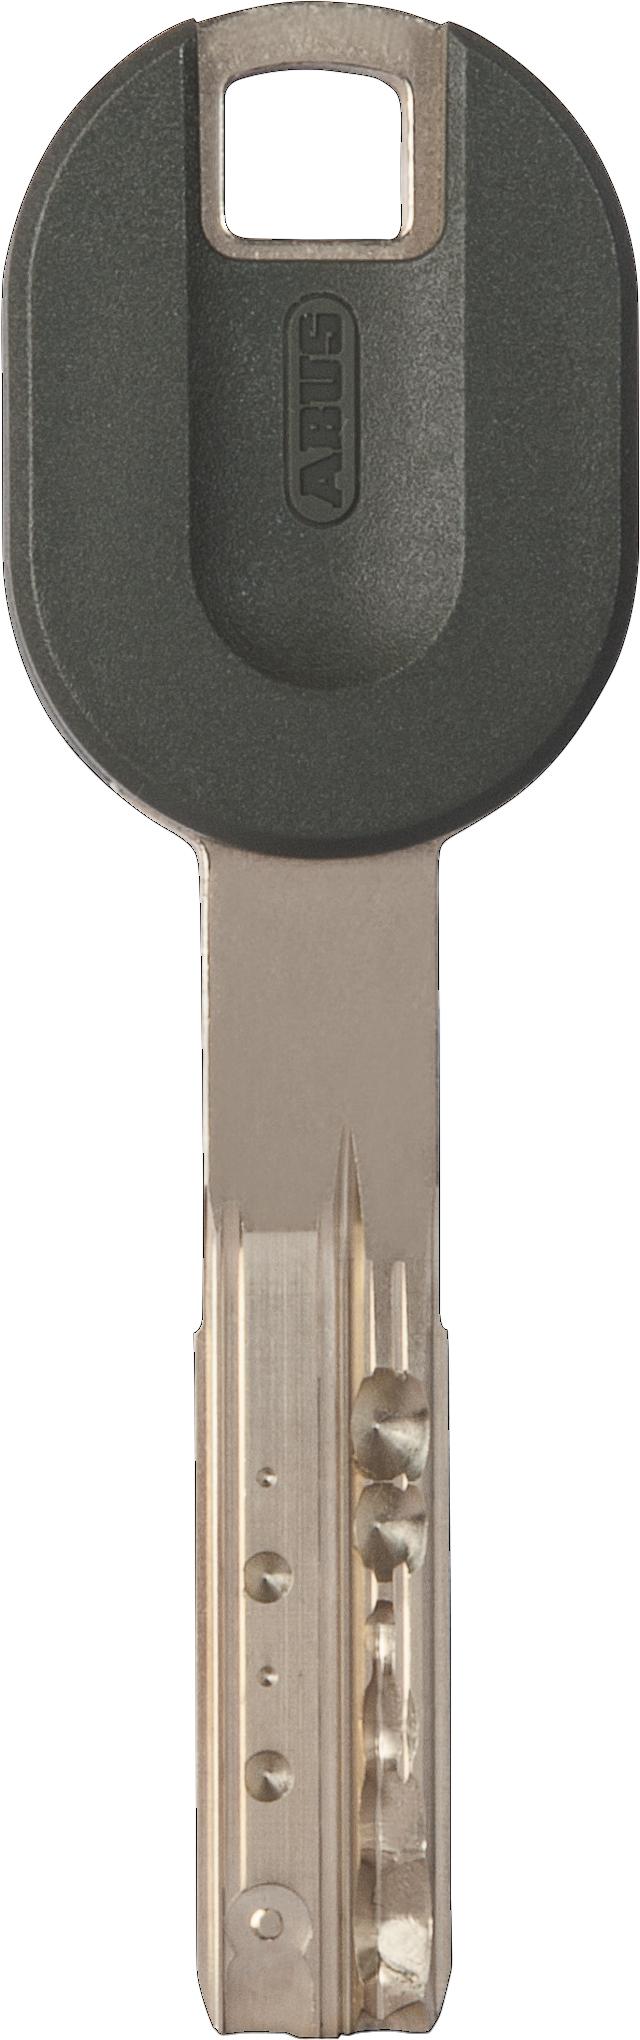 Schlüsselkappe Pro Cap grau